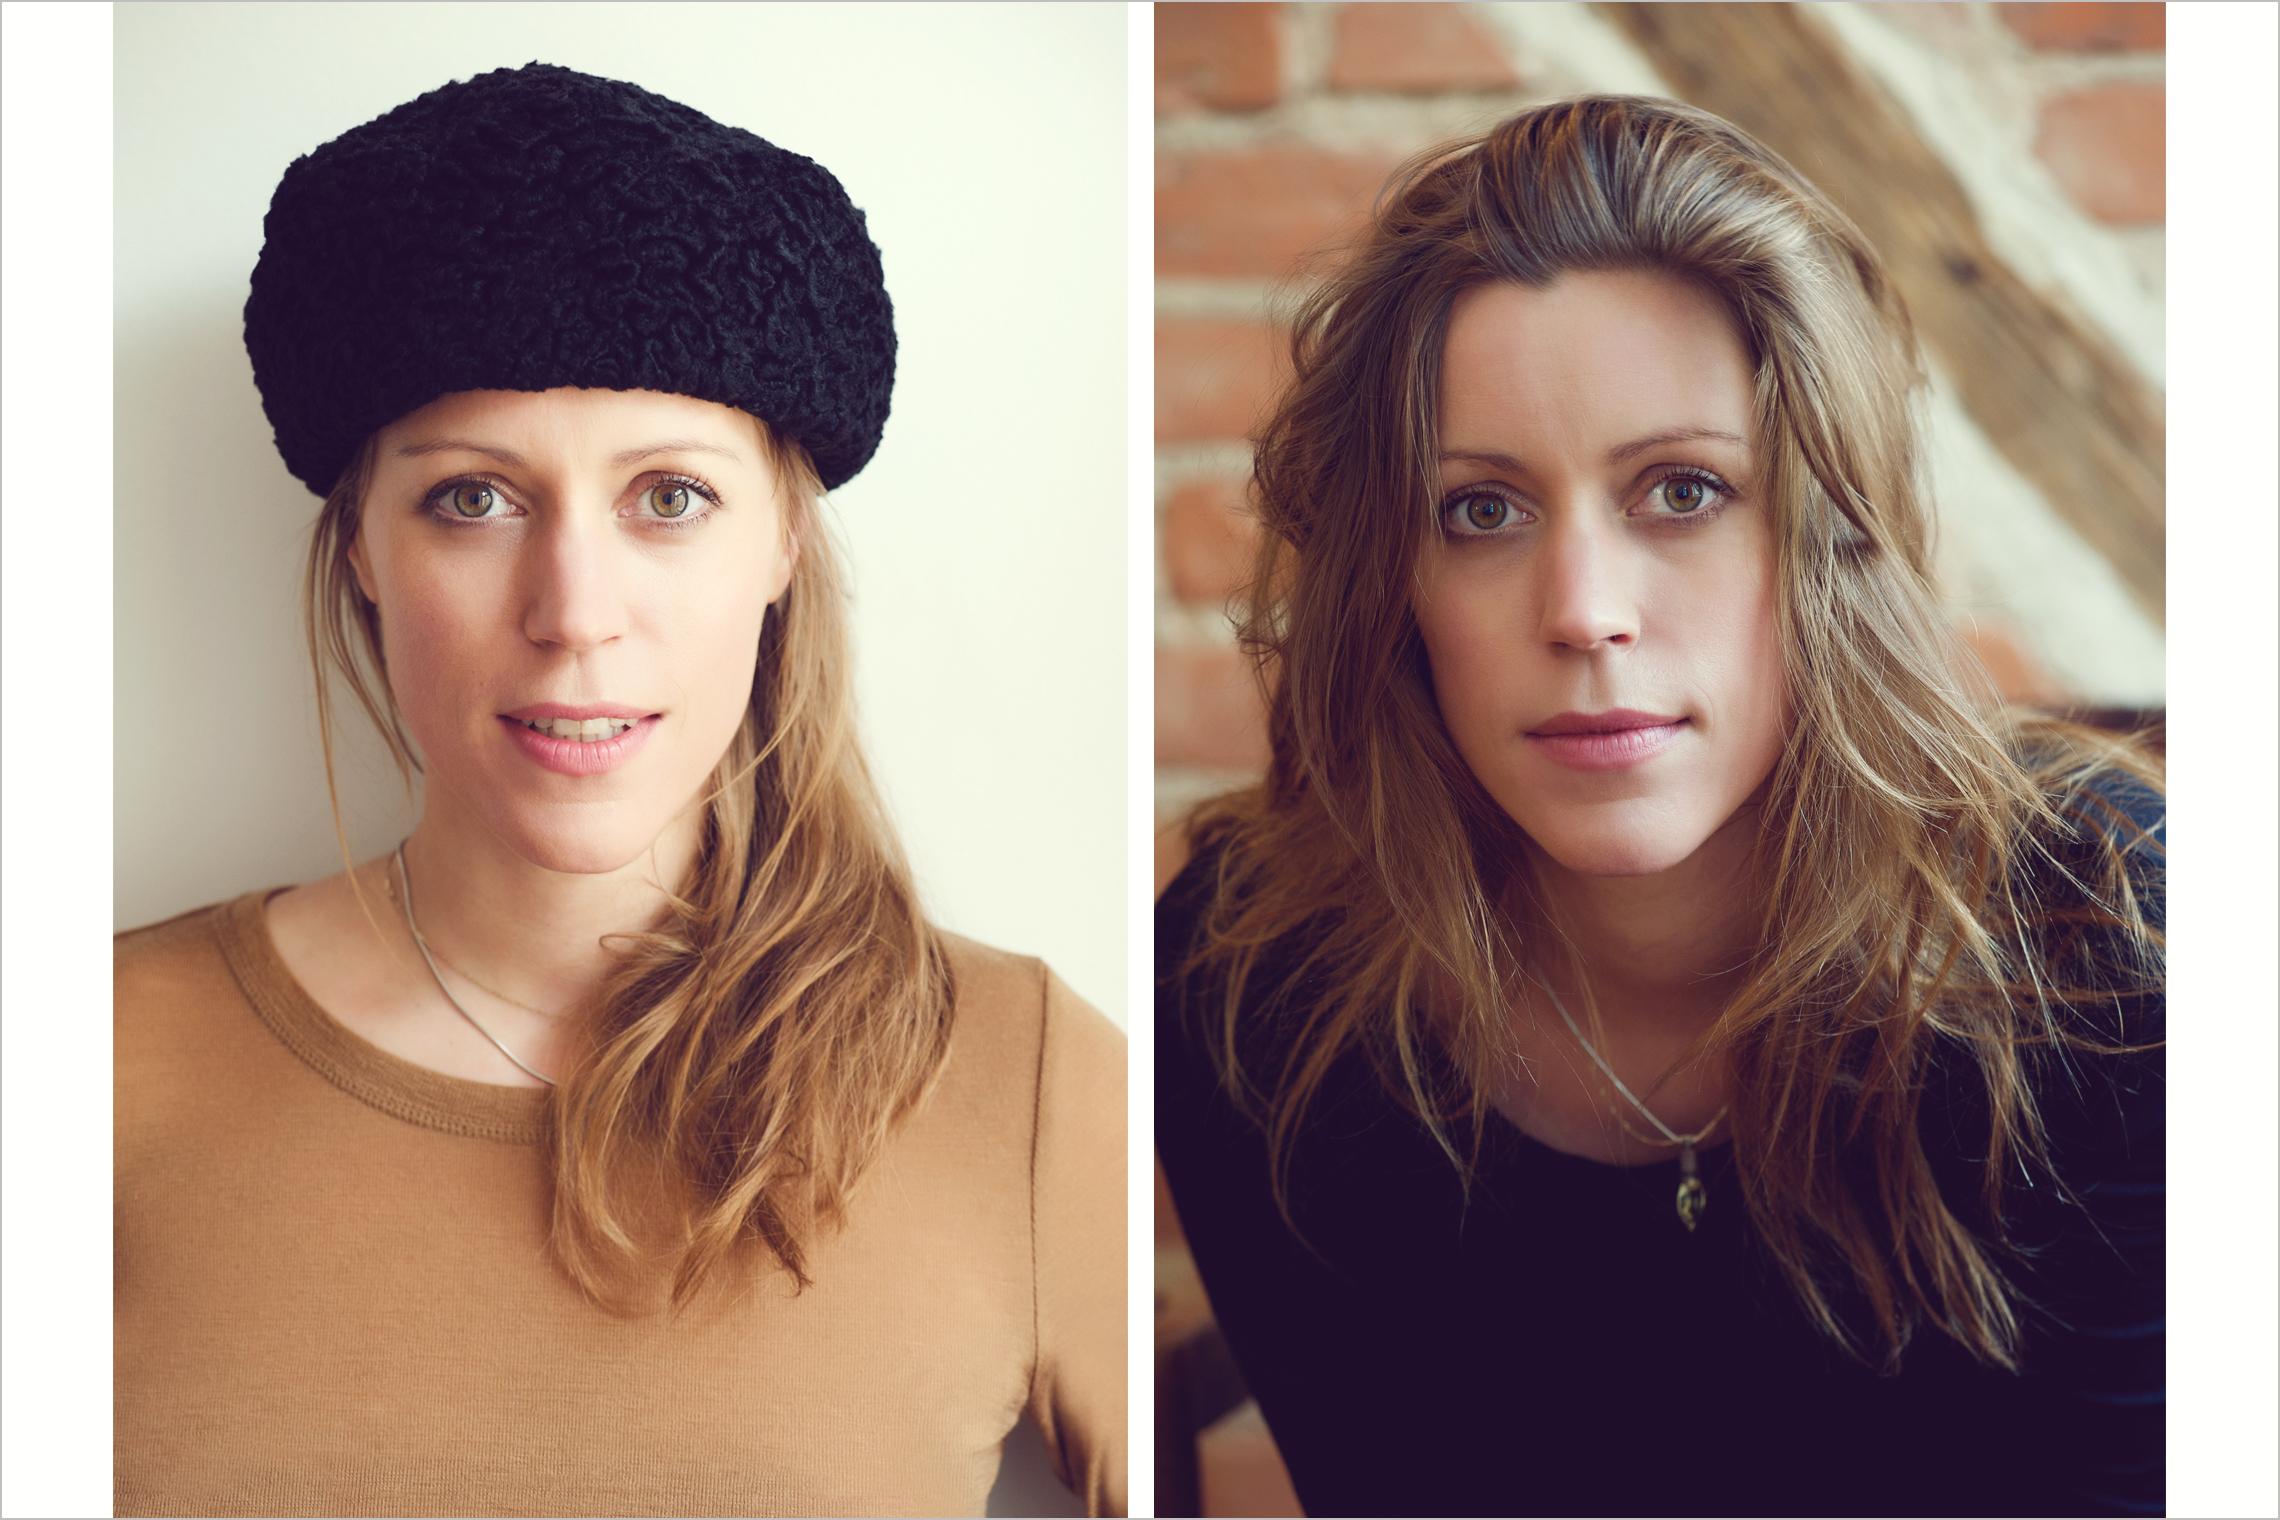 Künstlerfotos Schauspielerportrait Headshots Portraitfotografin Caro Hoene Photography Berlin